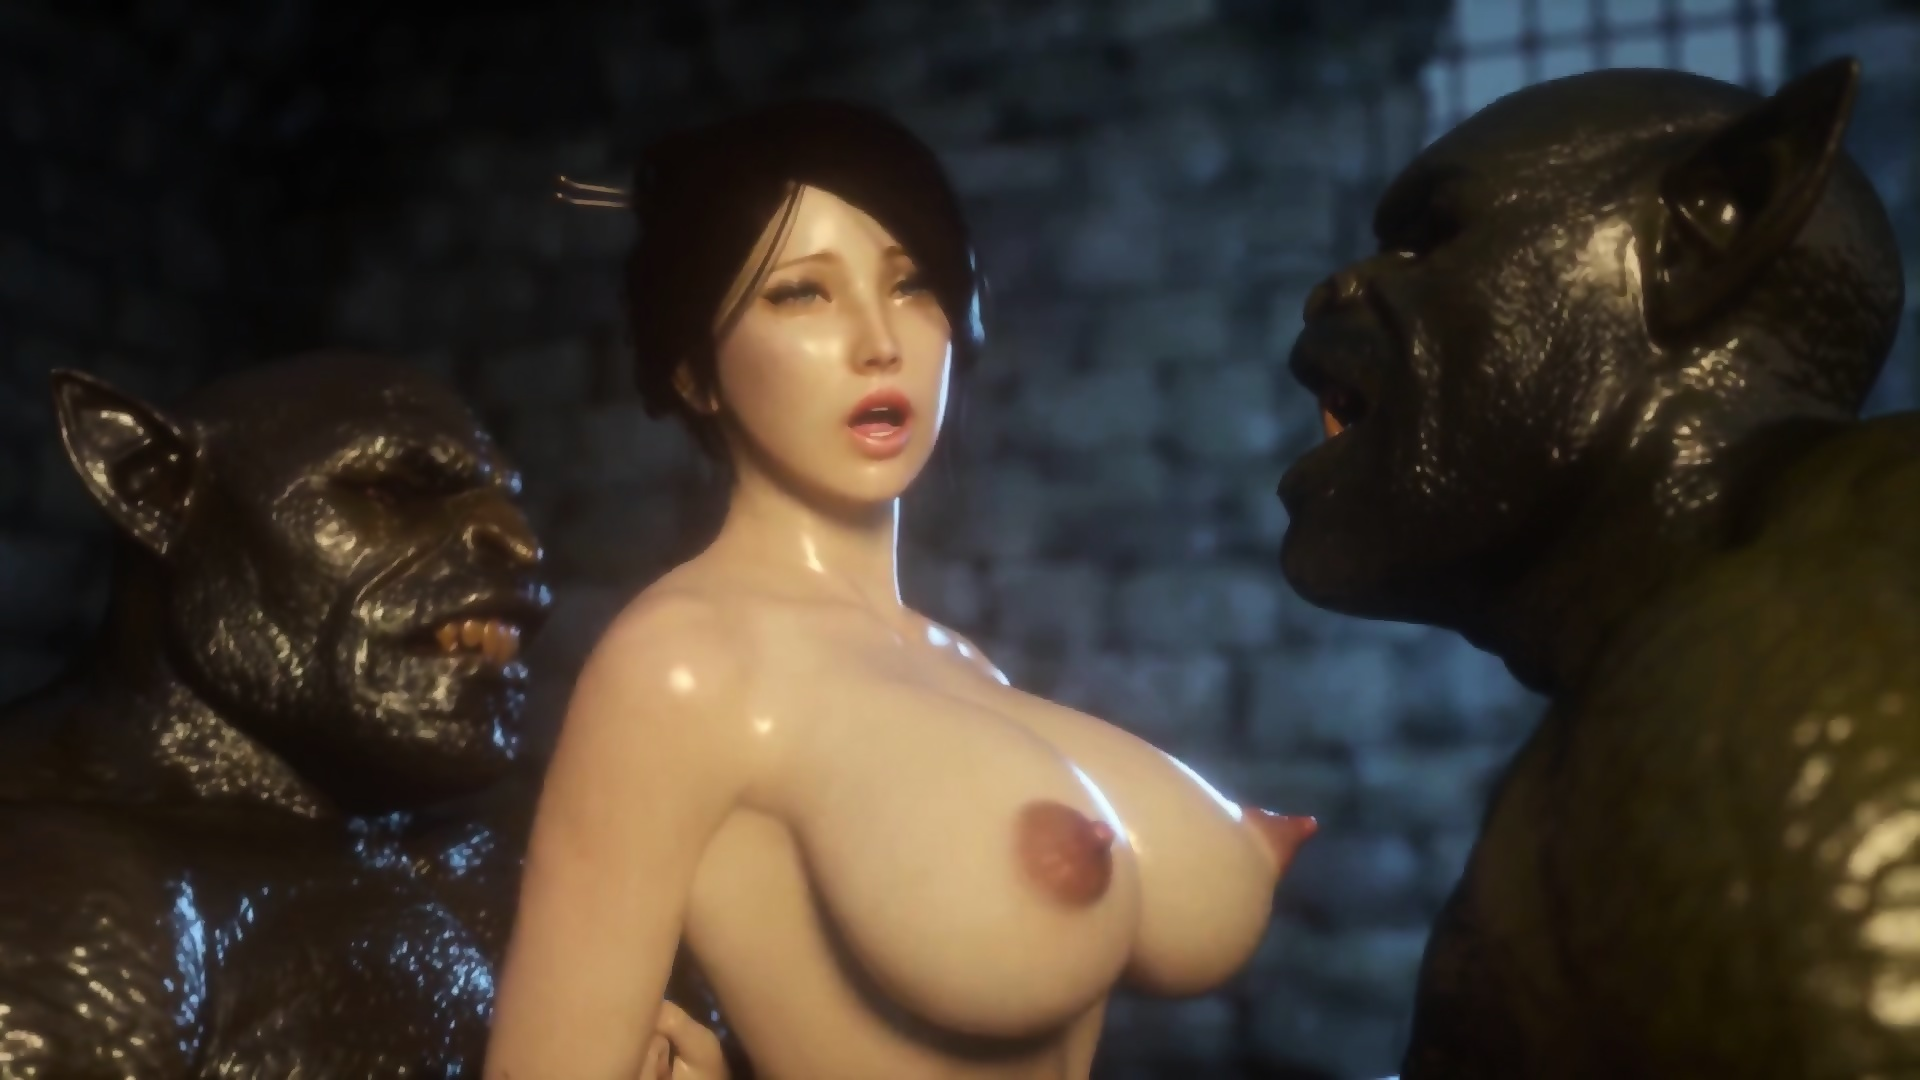 Sexual Fantasy 3d Hentai